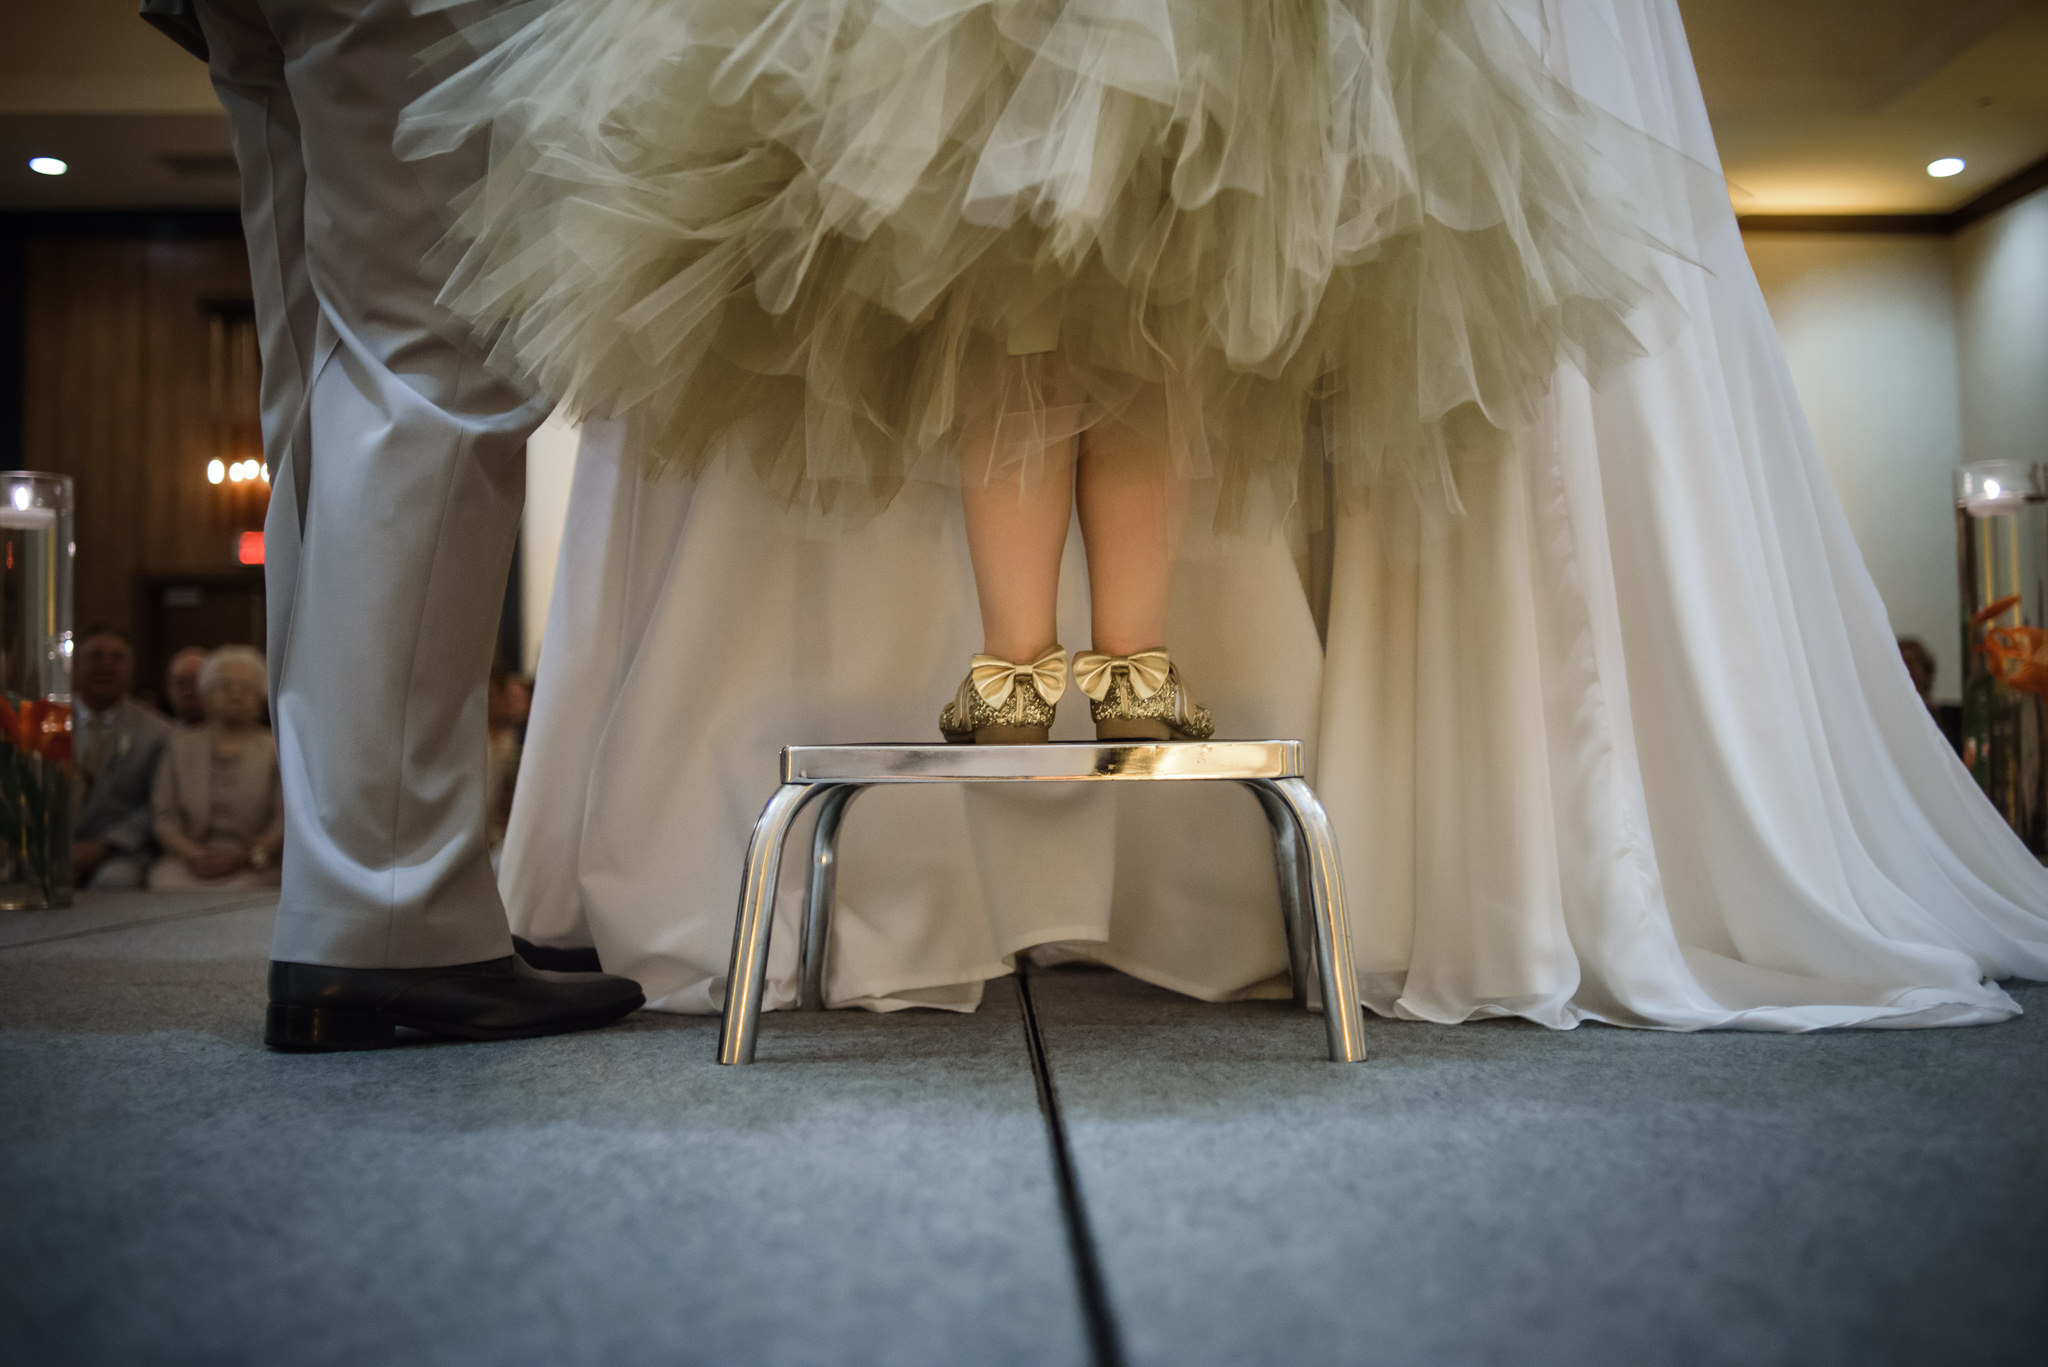 HILTON-OMAHA-WEDDING-PHOTOGRAPHER-JM-STUDIOS-OMAHA-LIV-BRICE-026.jpg